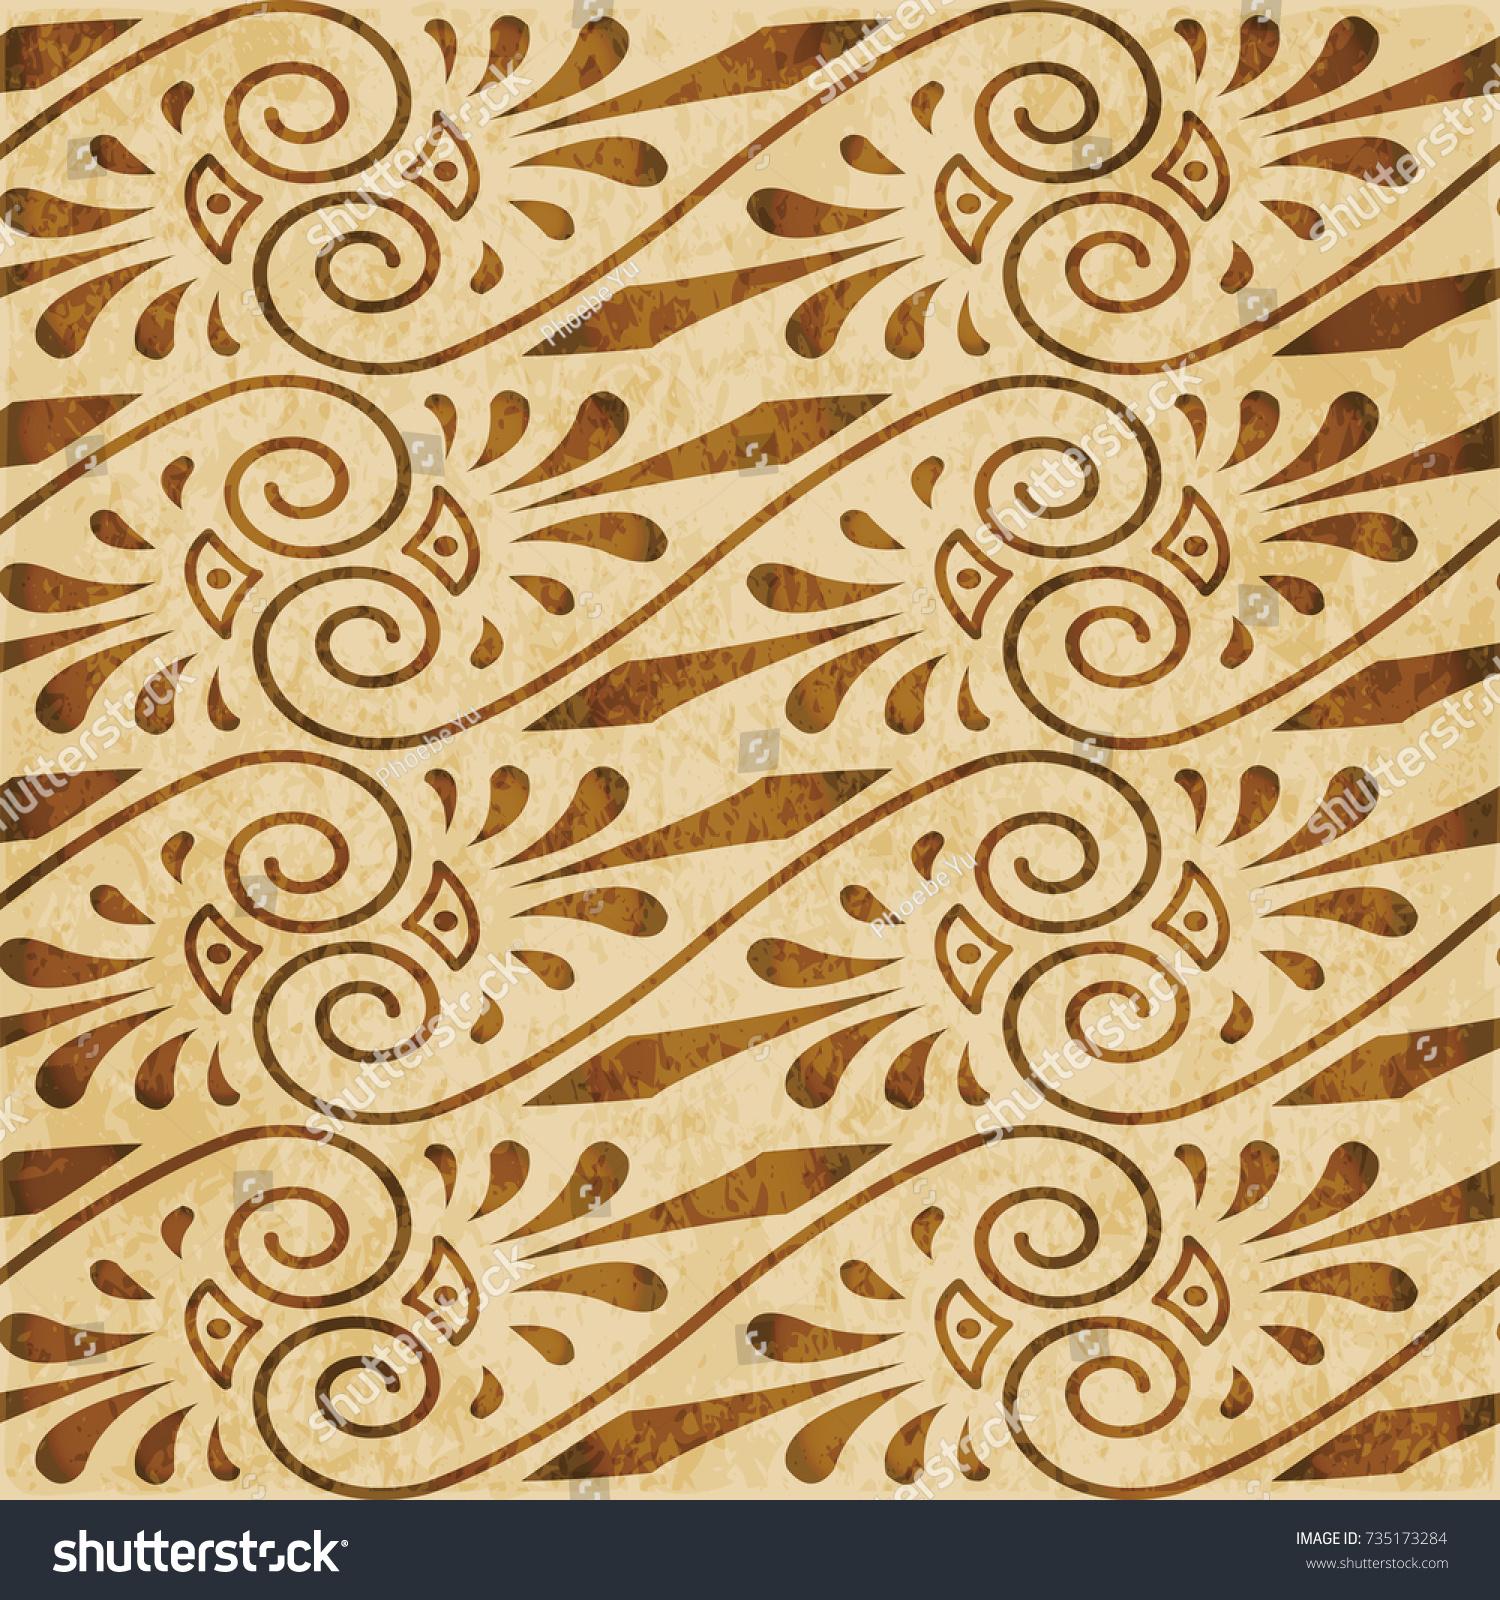 Retro Brown Watercolor Texture Grunge Seamless Stock Photo (Photo ...